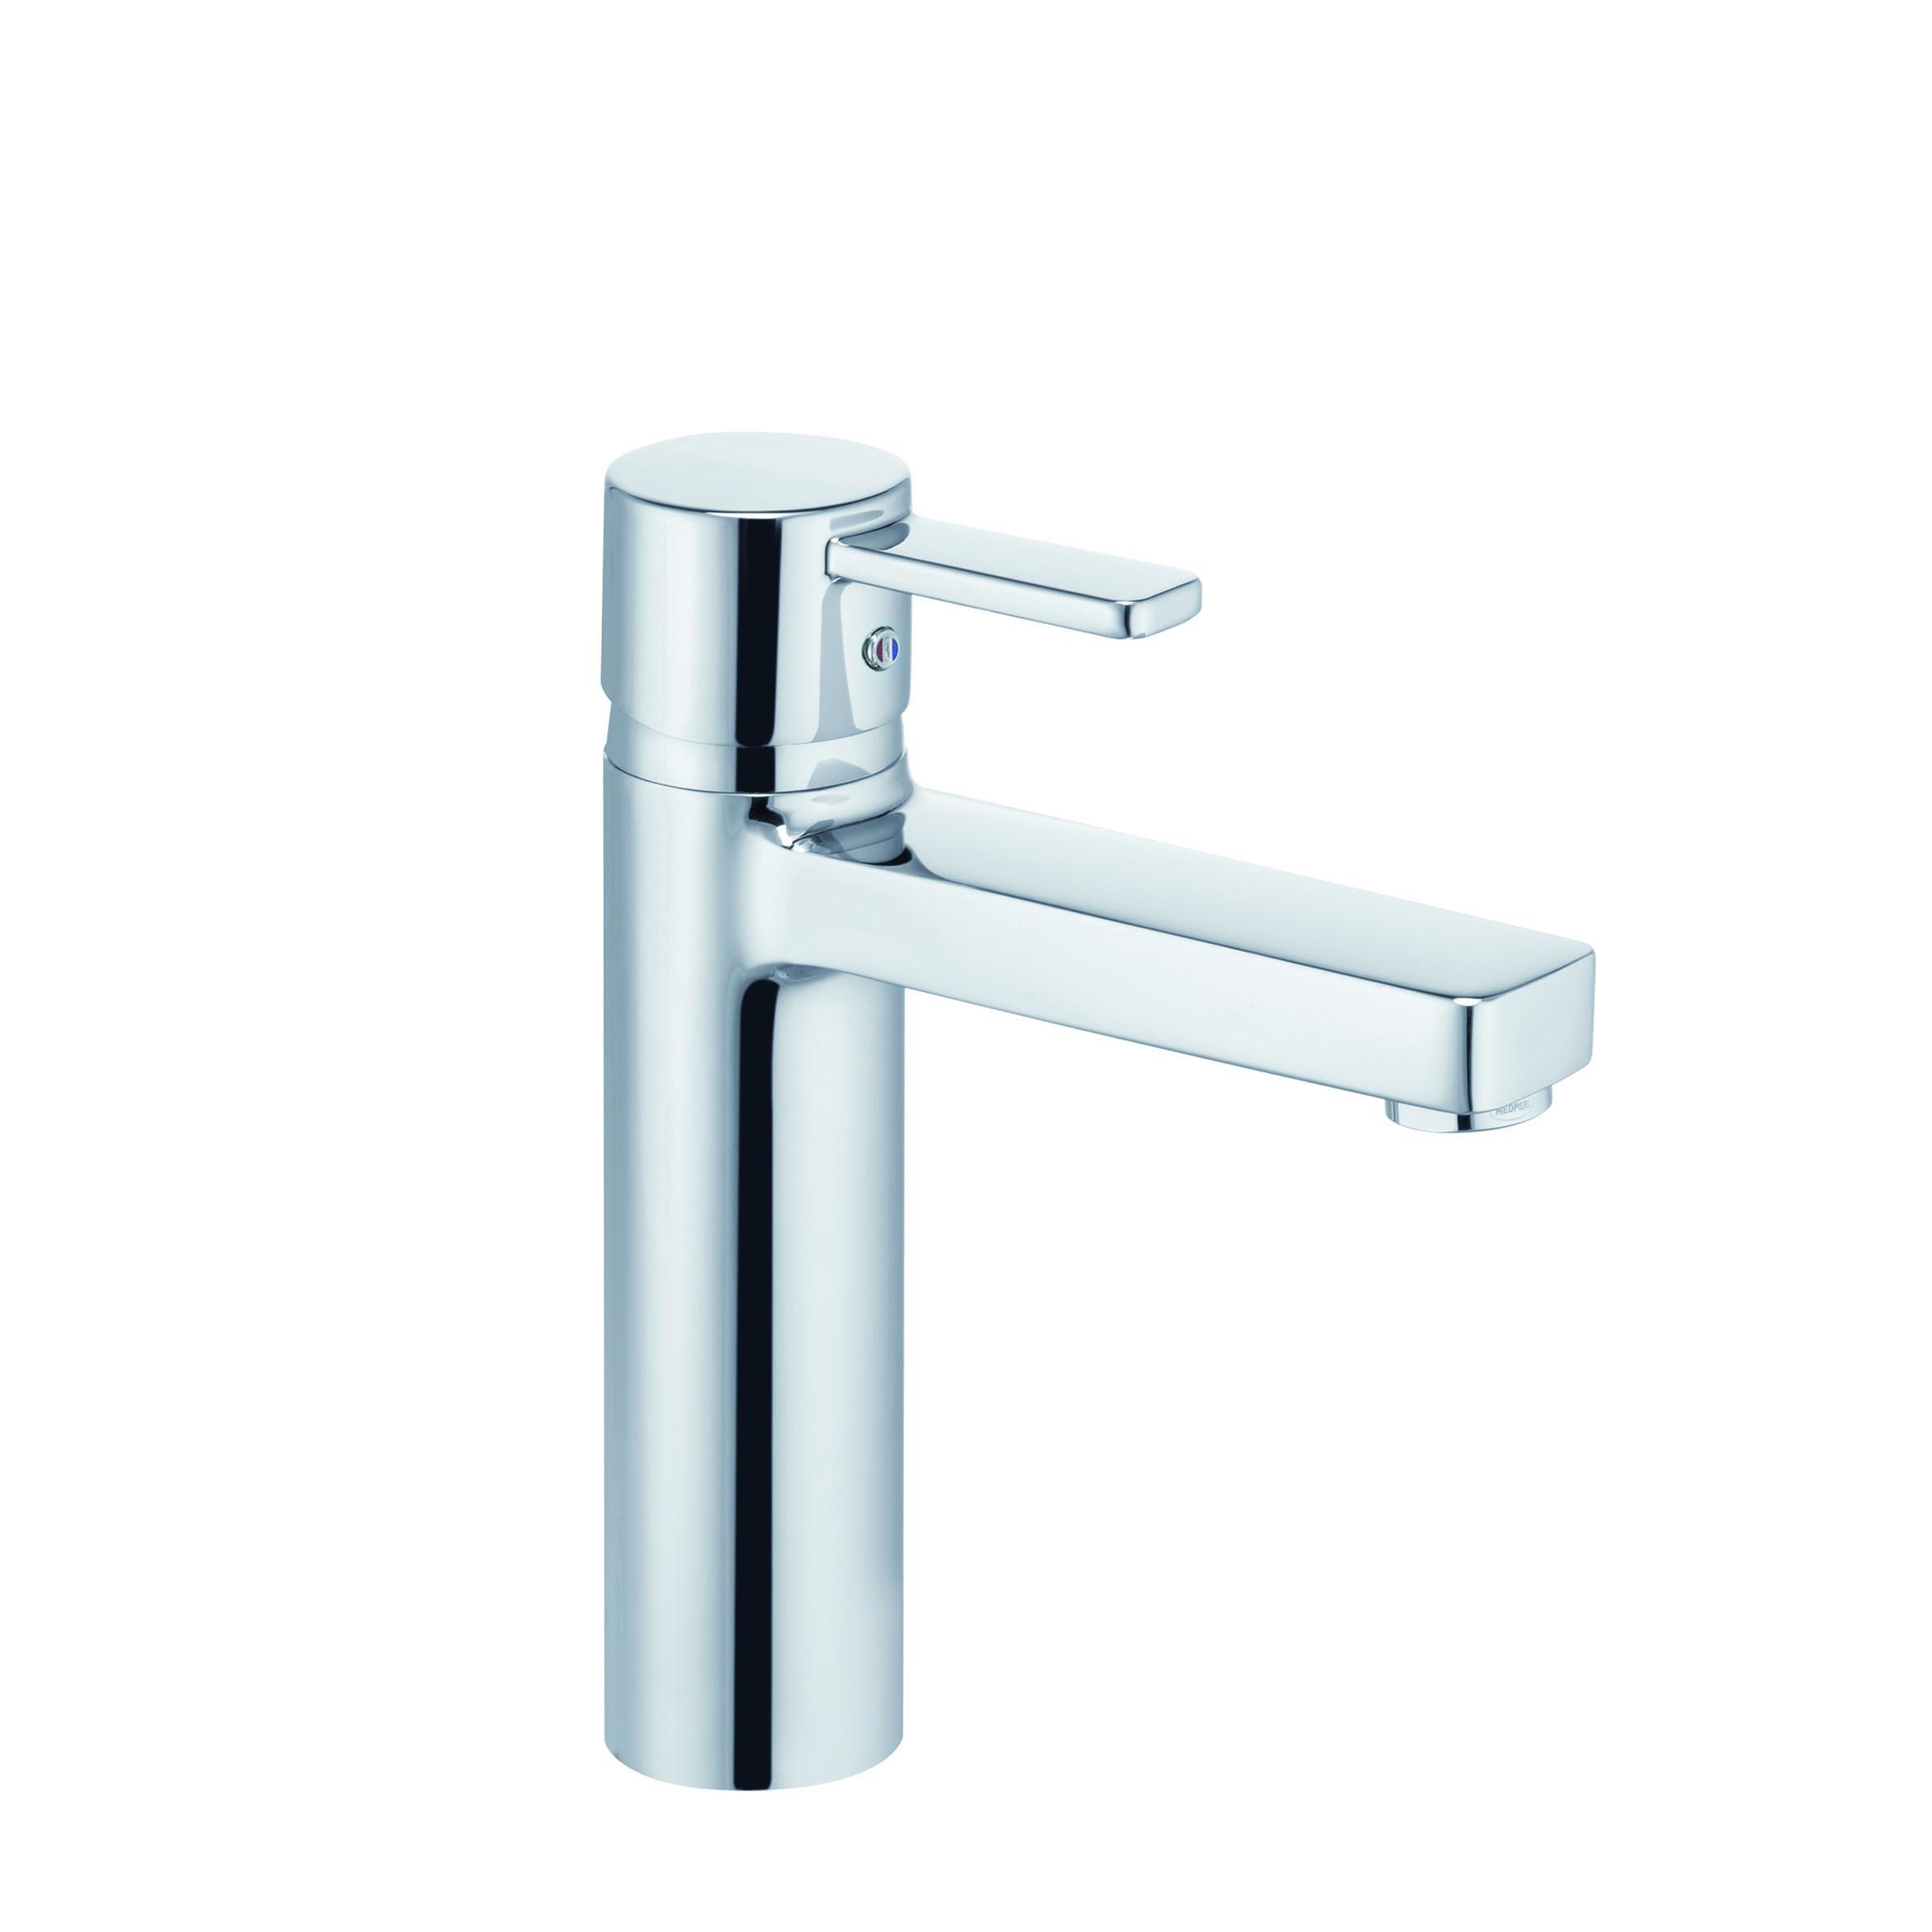 KLUDI ZENTA lage waskommengkraan 120mm 382650575 | KLUDI ...